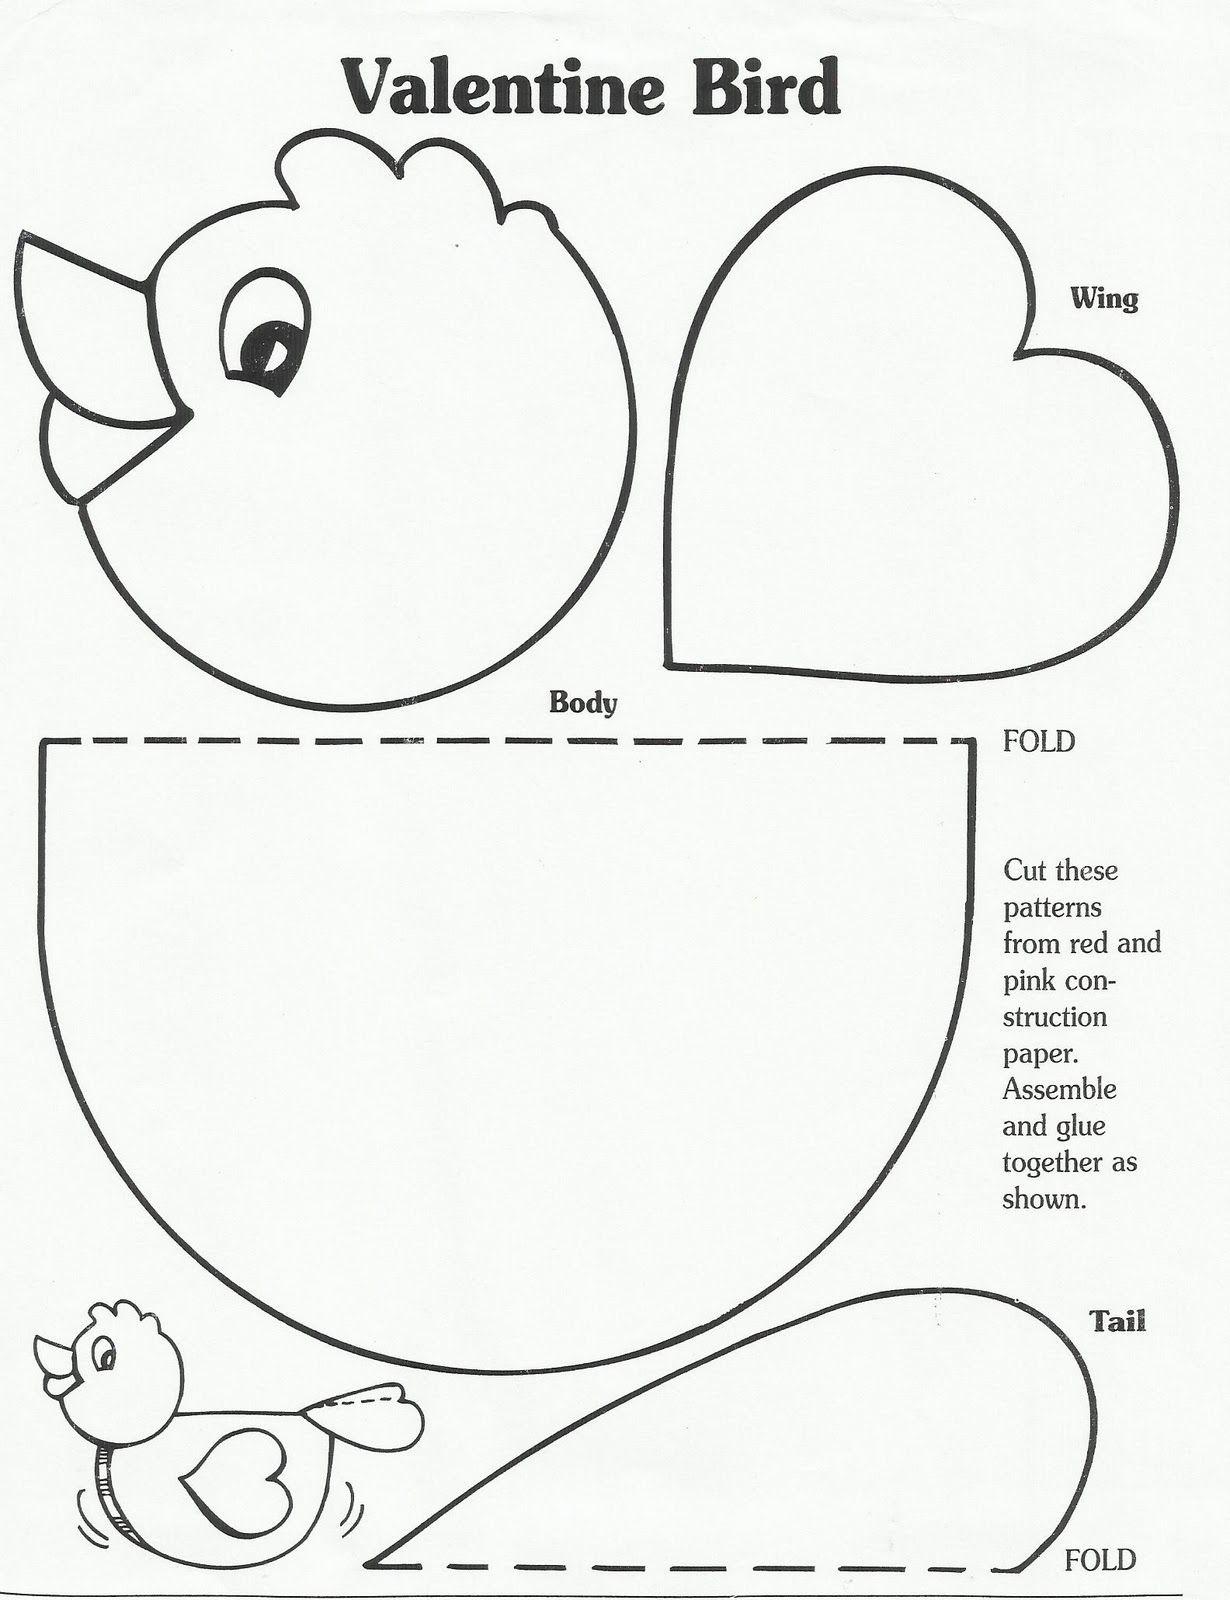 Heart Patterns Worksheet For Preschoolers